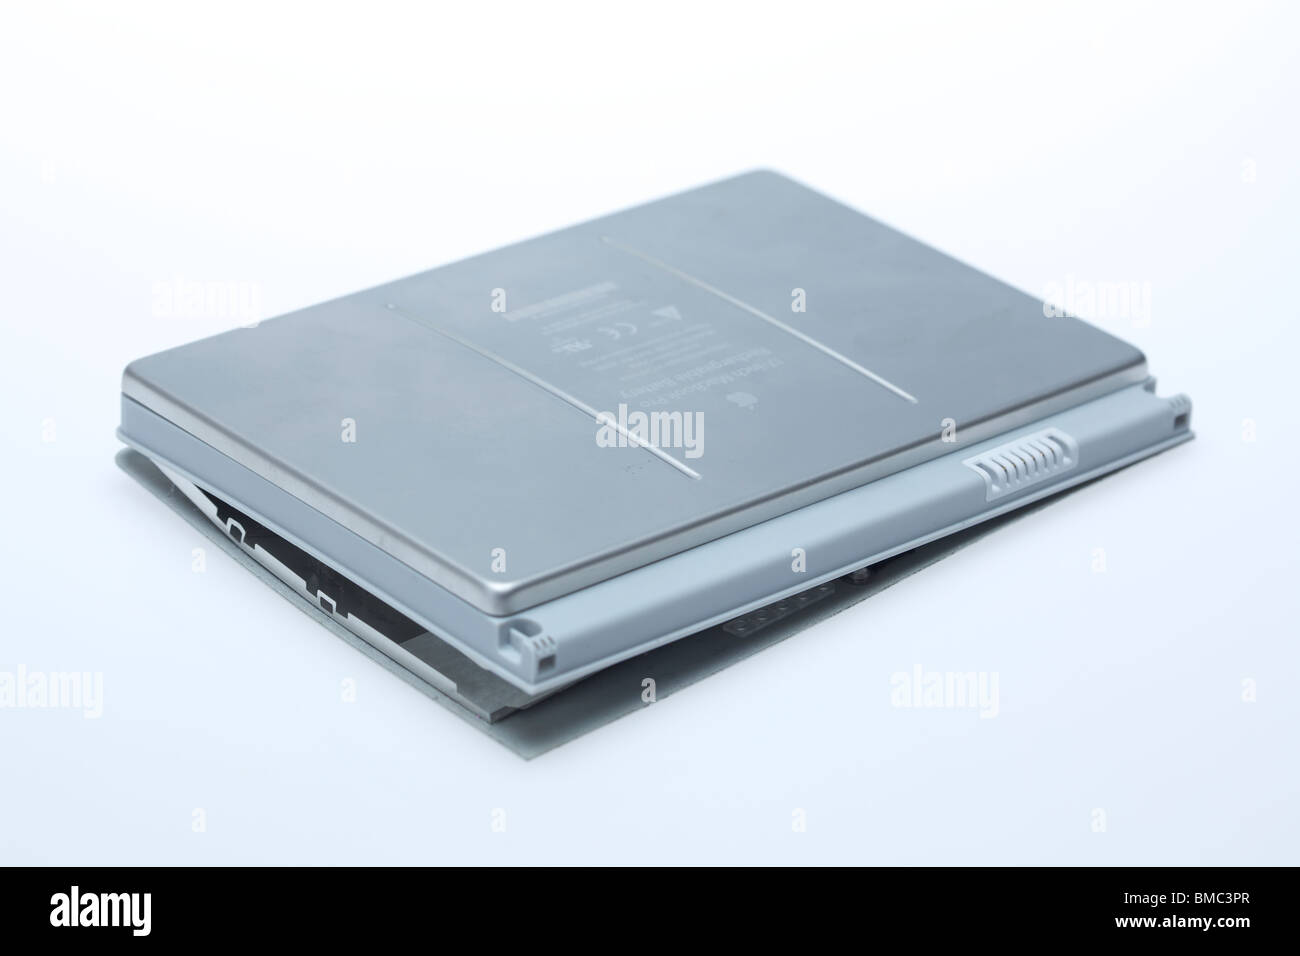 Damaged Macbook Pro laptop battery - Stock Image